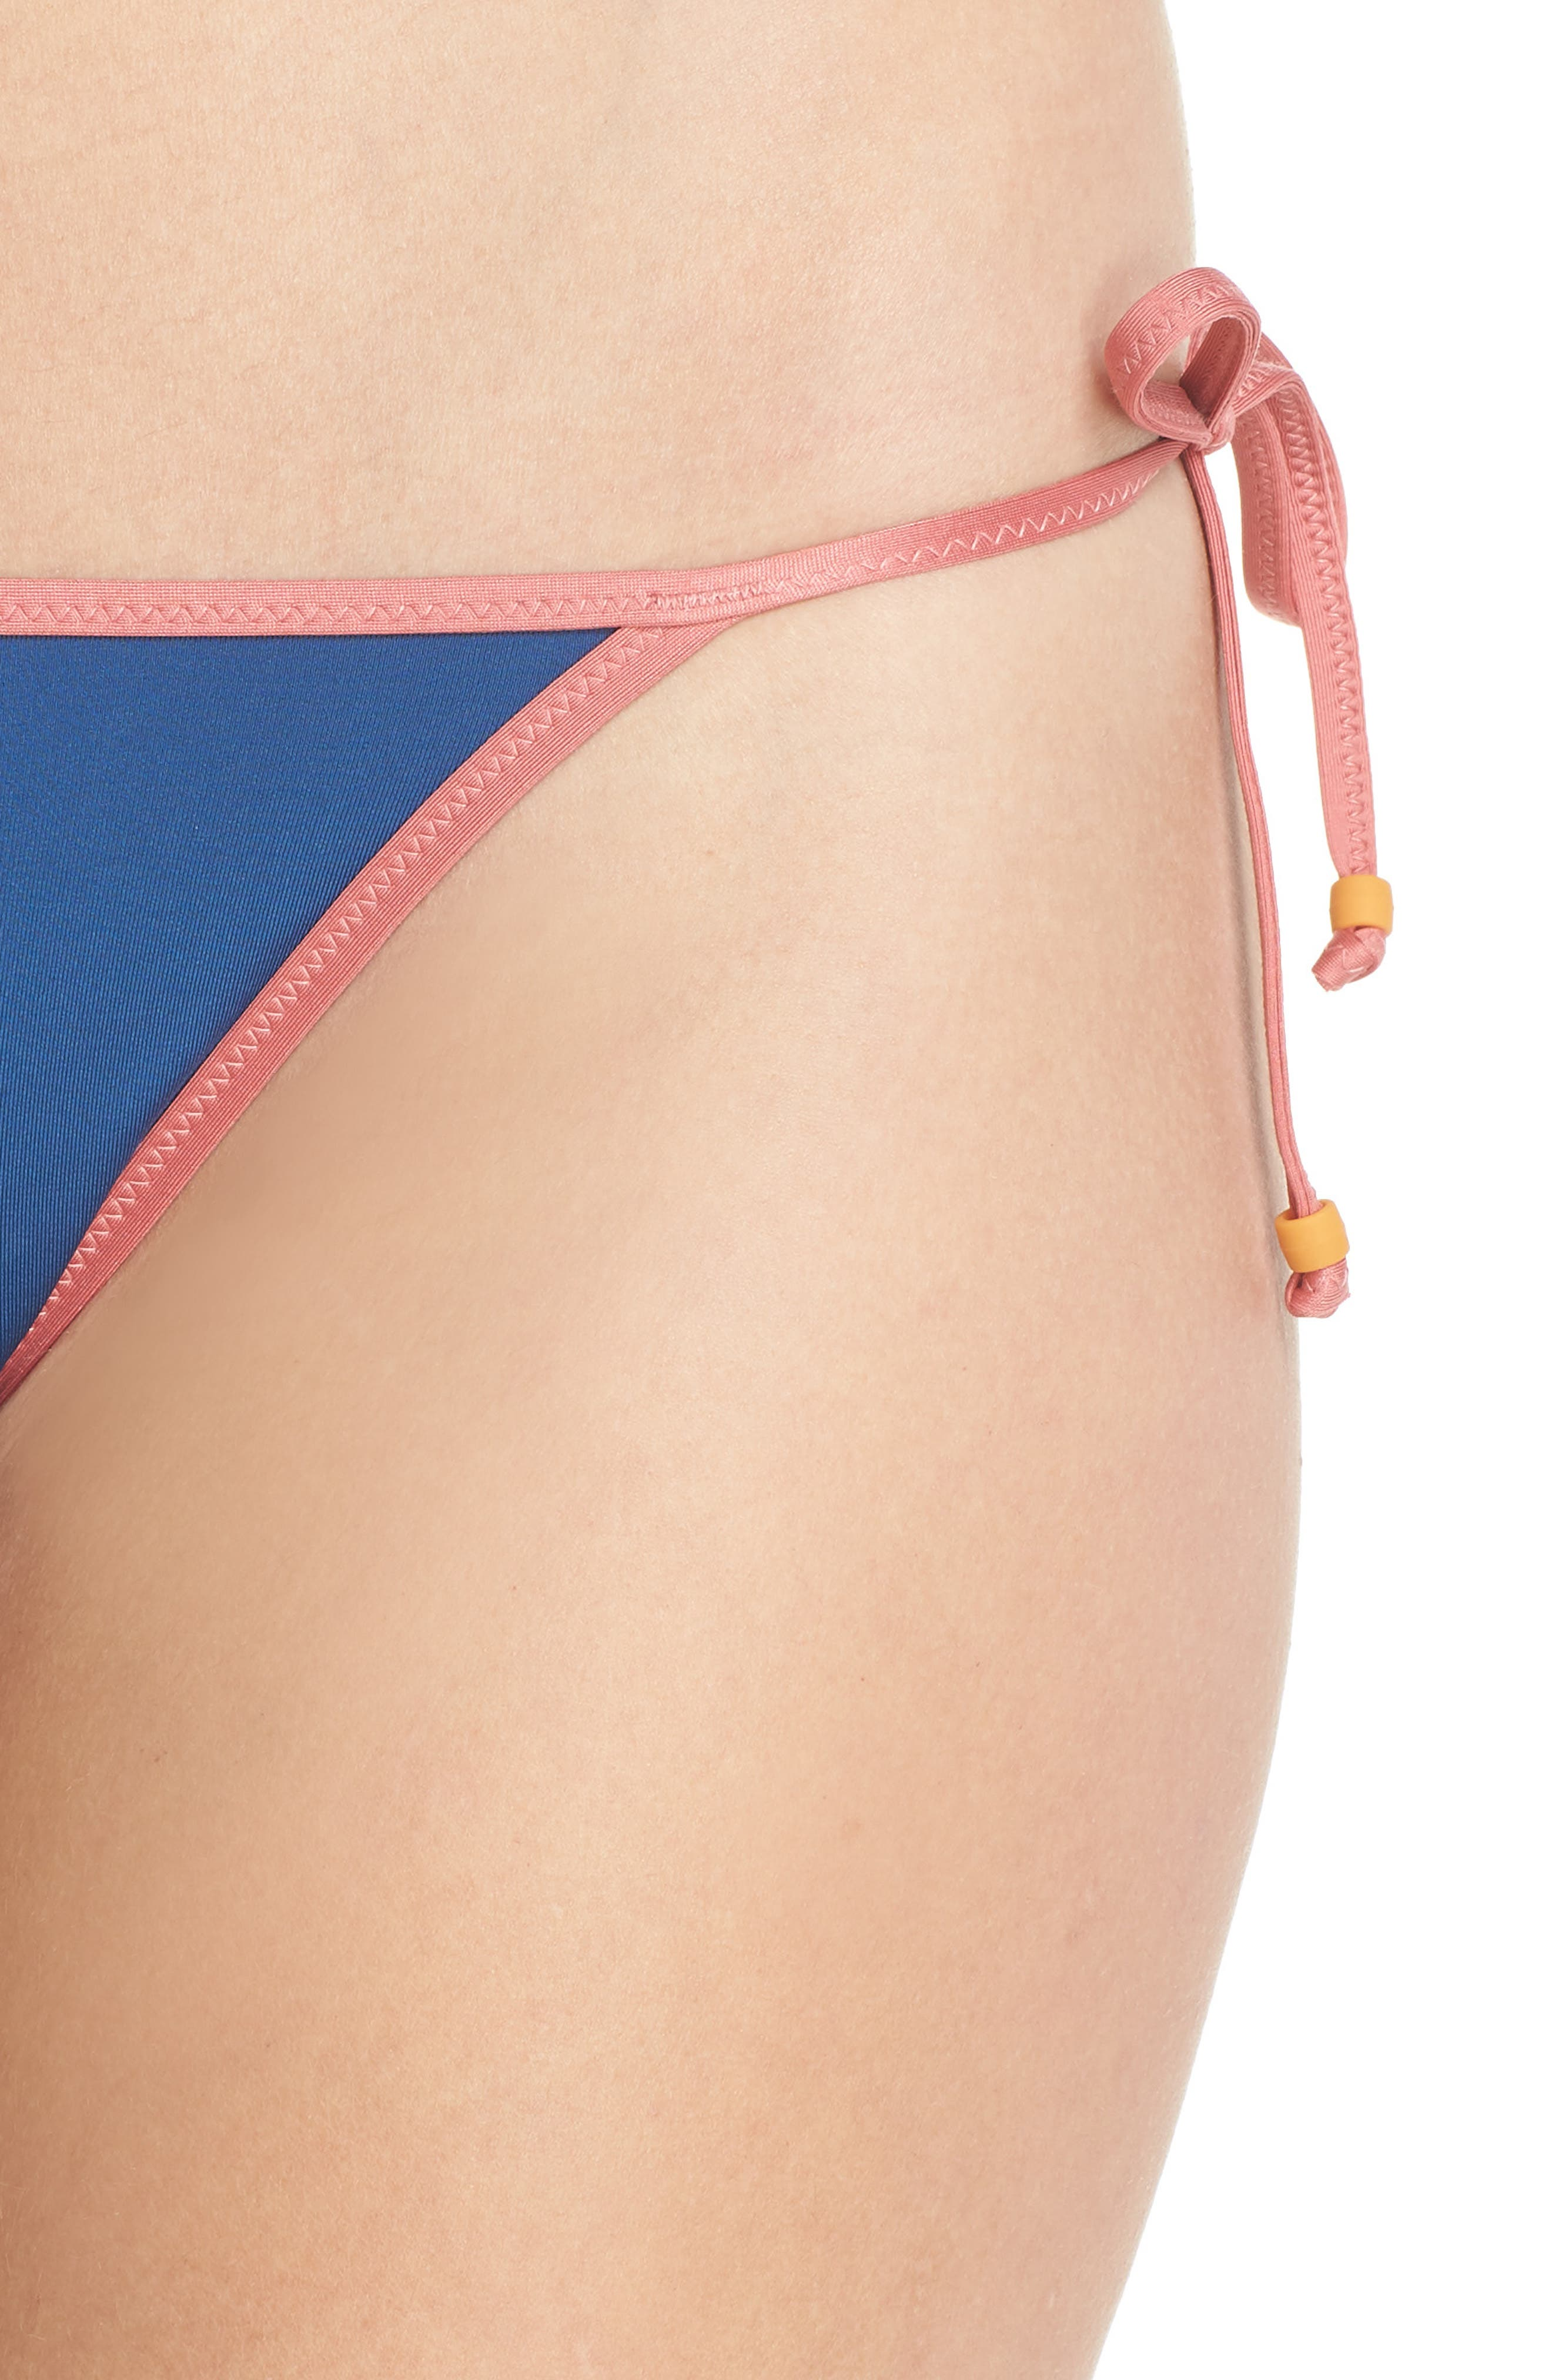 Playa Miami String Bikini Bottoms,                             Alternate thumbnail 4, color,                             Pacific Ocean Multi